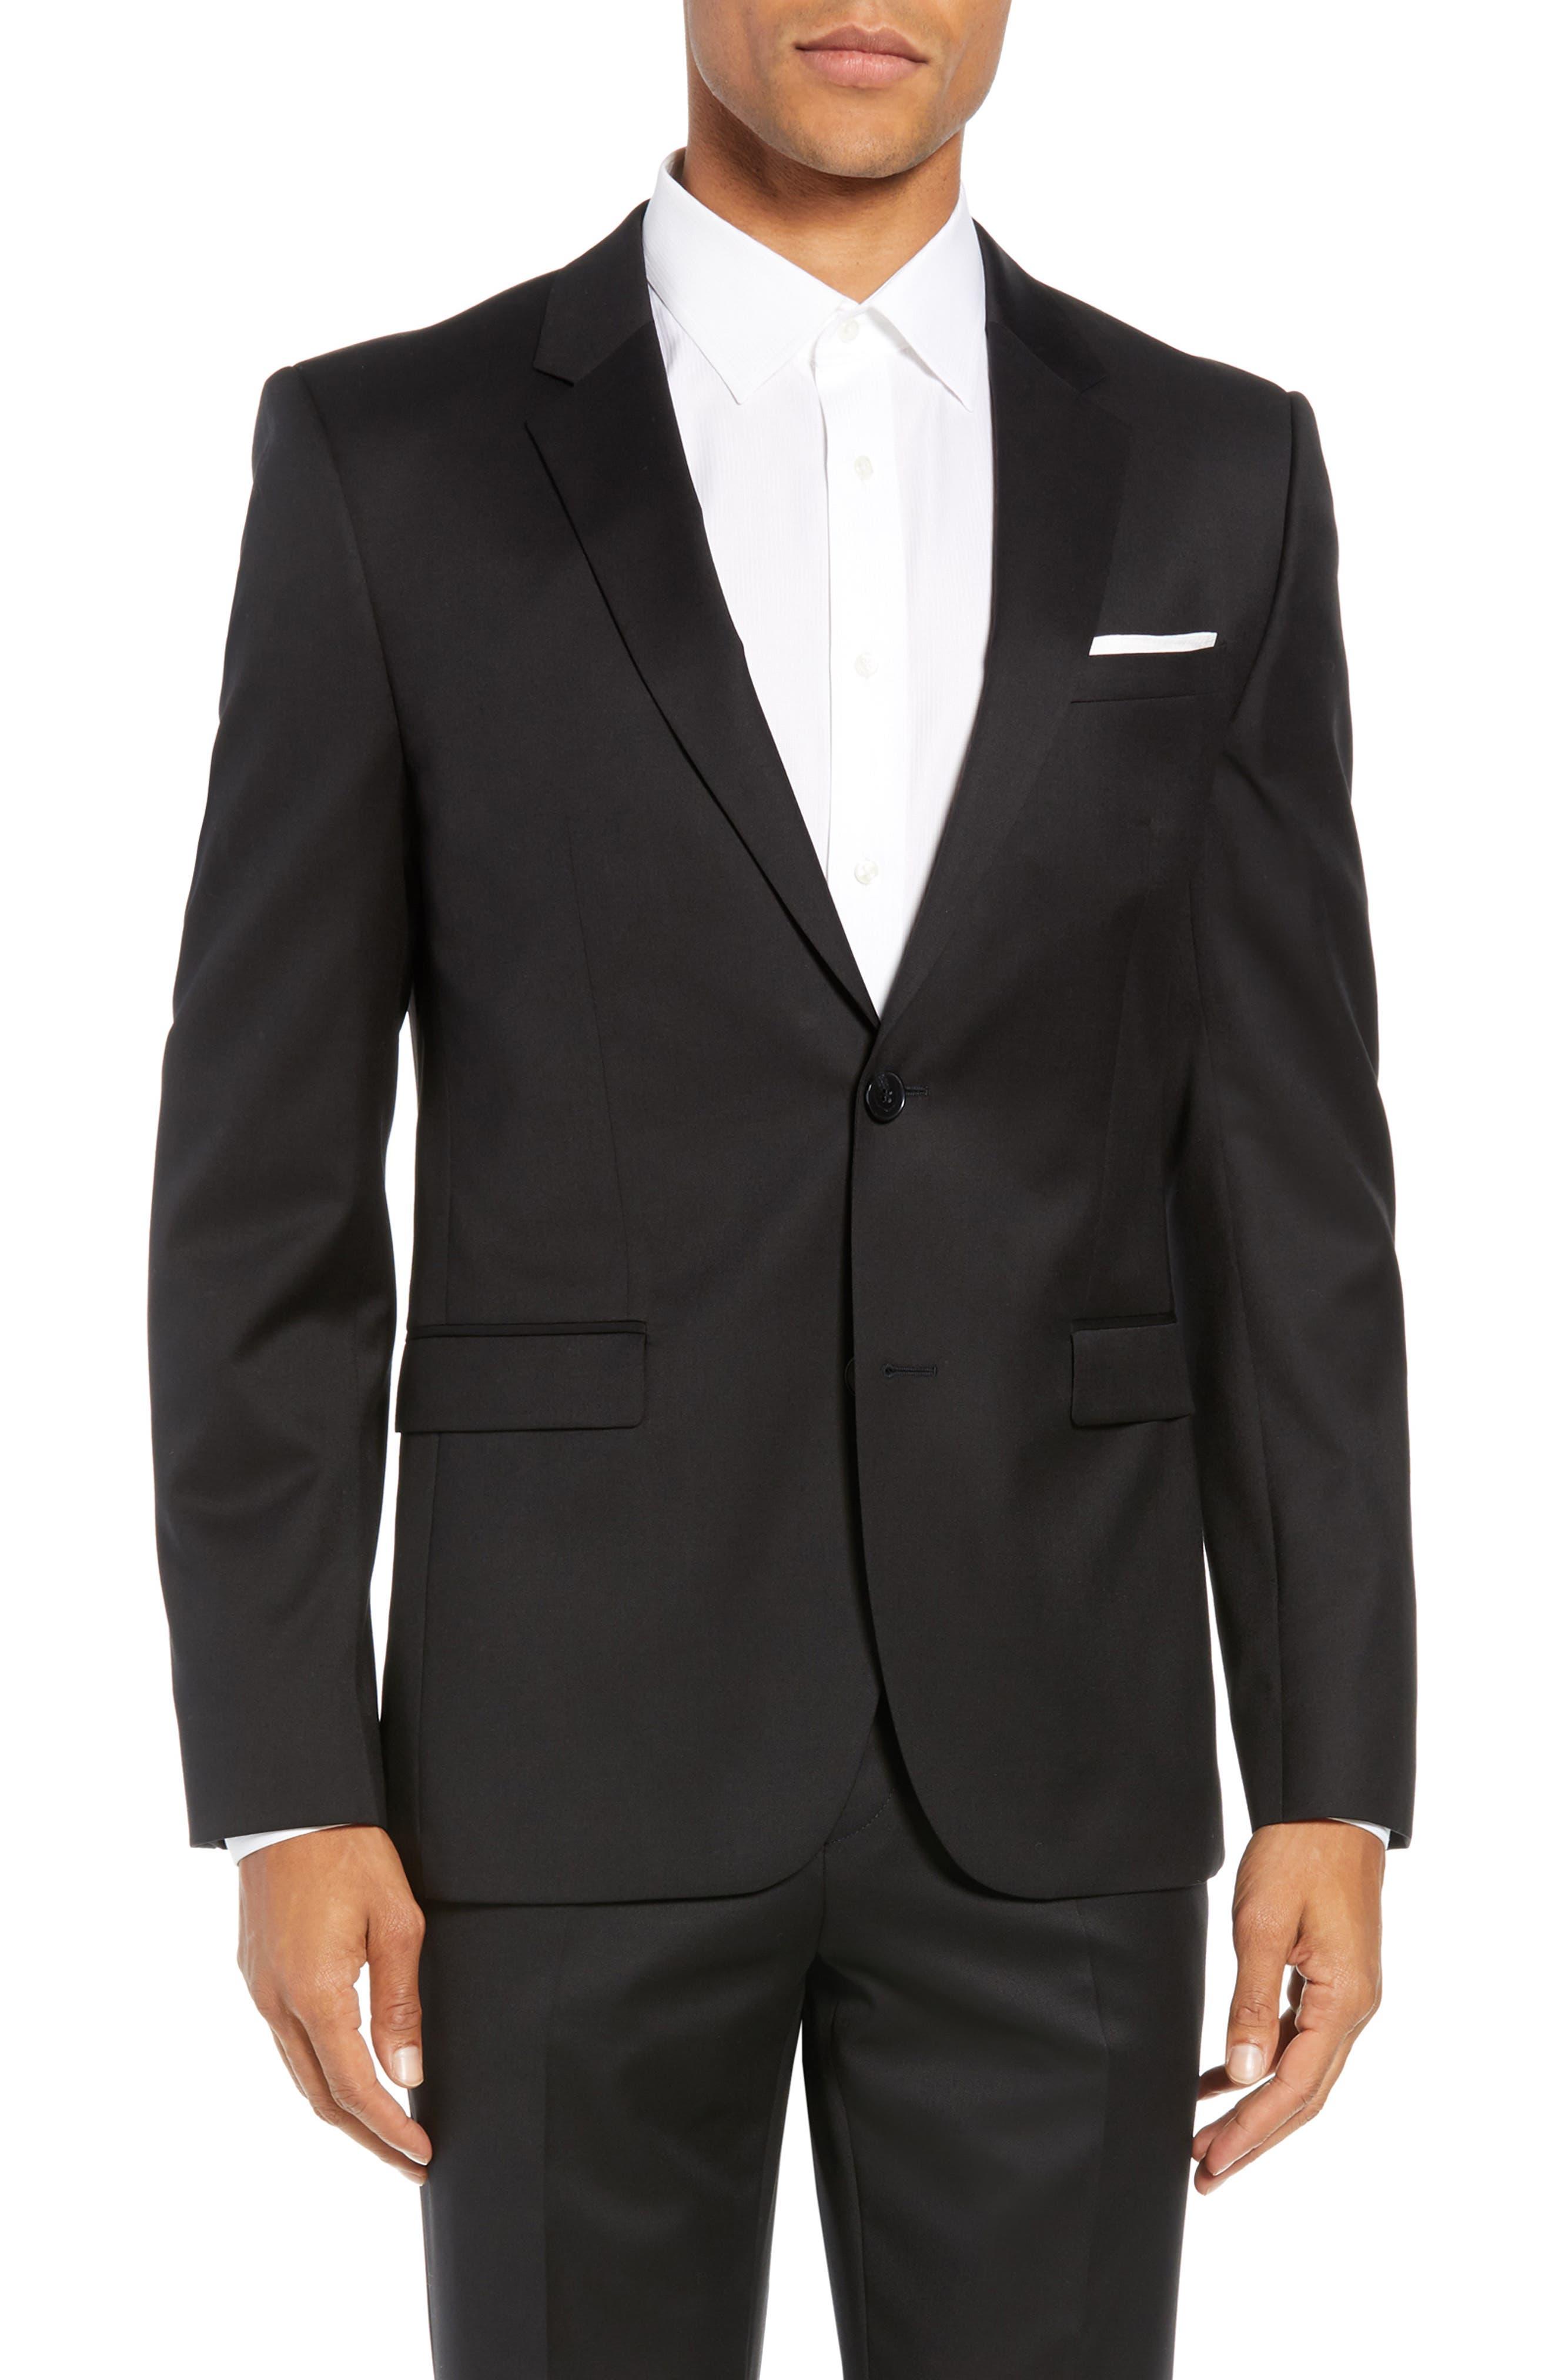 Aldon Extra Slim Fit Blazer,                             Main thumbnail 1, color,                             BLACK